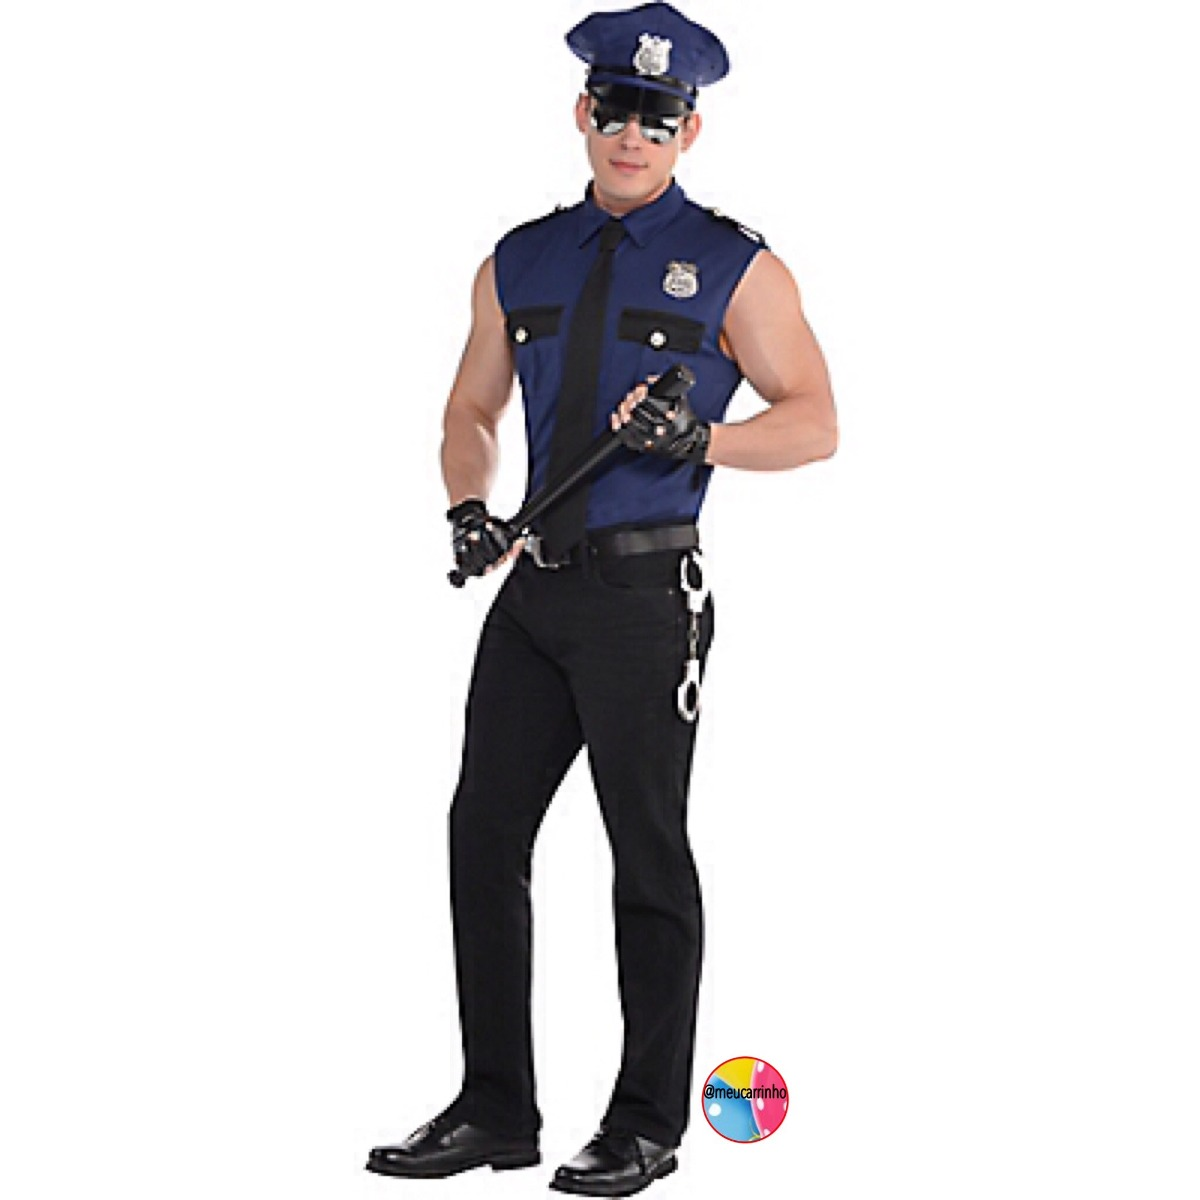 Fantasia Policia Ladrao - Encomenda- Entrega Rapida